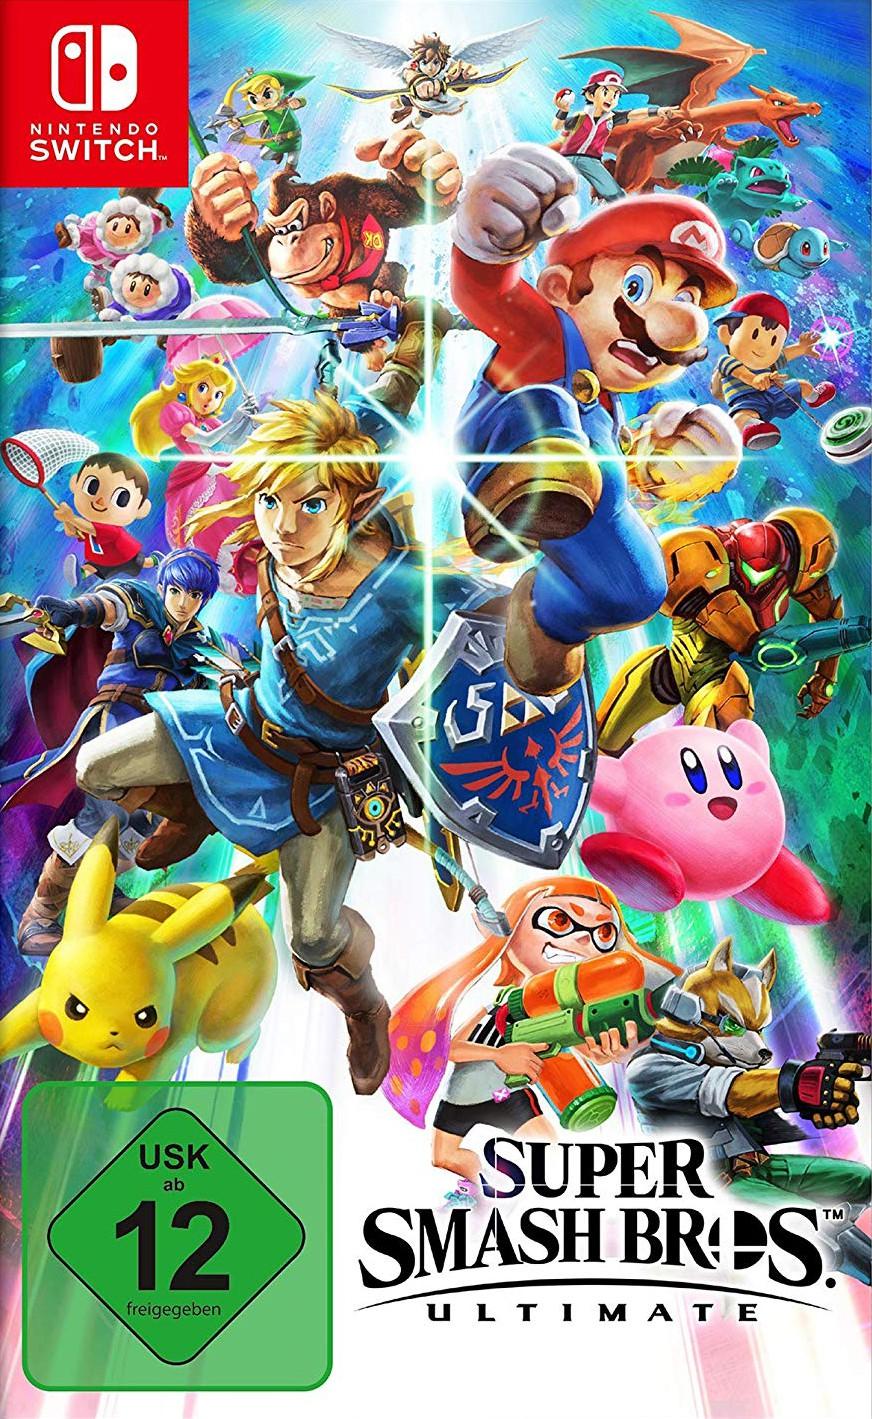 Nintendo Switch - Super Smash Bros. Ultimate